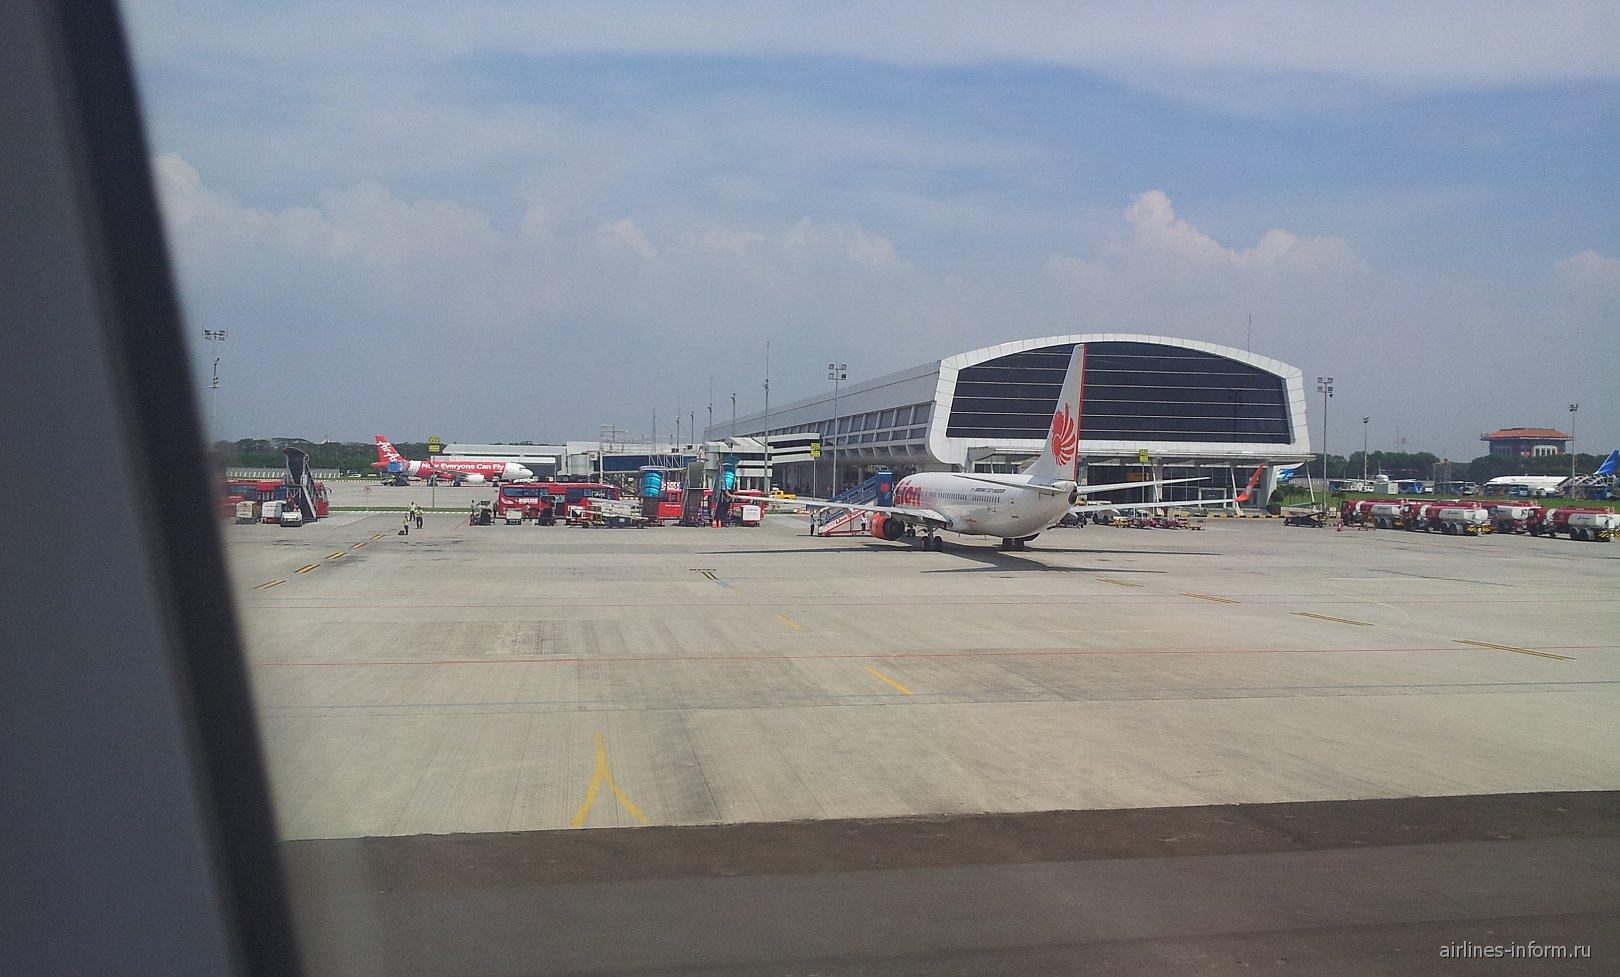 Бюджетный терминал аэропорта Джакарта Сукарно-Хатта